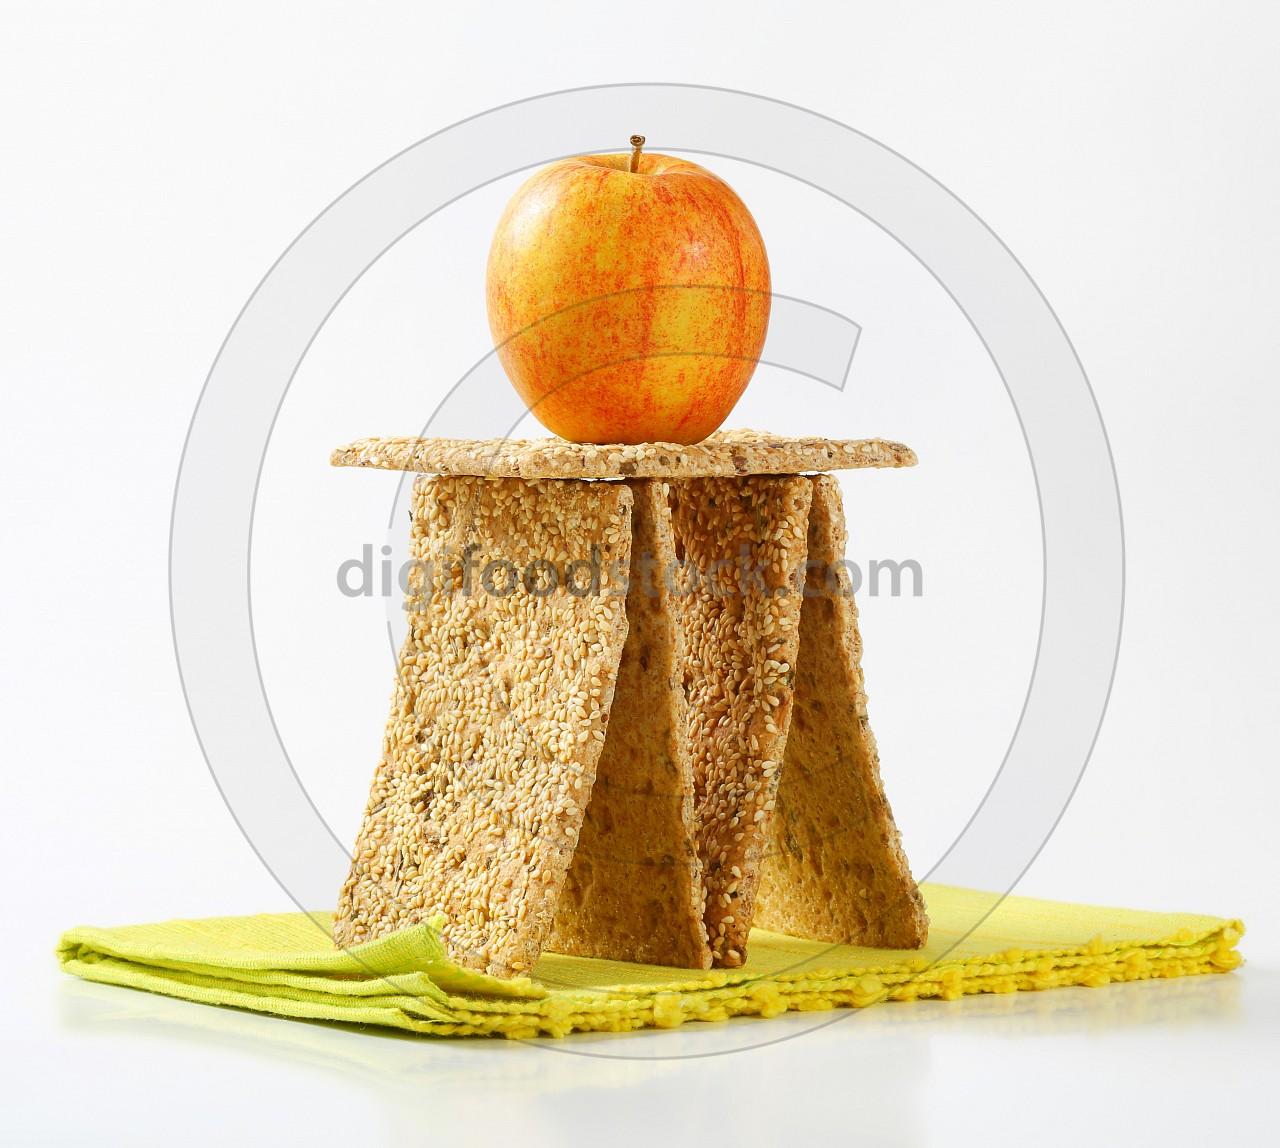 Sesame seed crackers and fresh apple